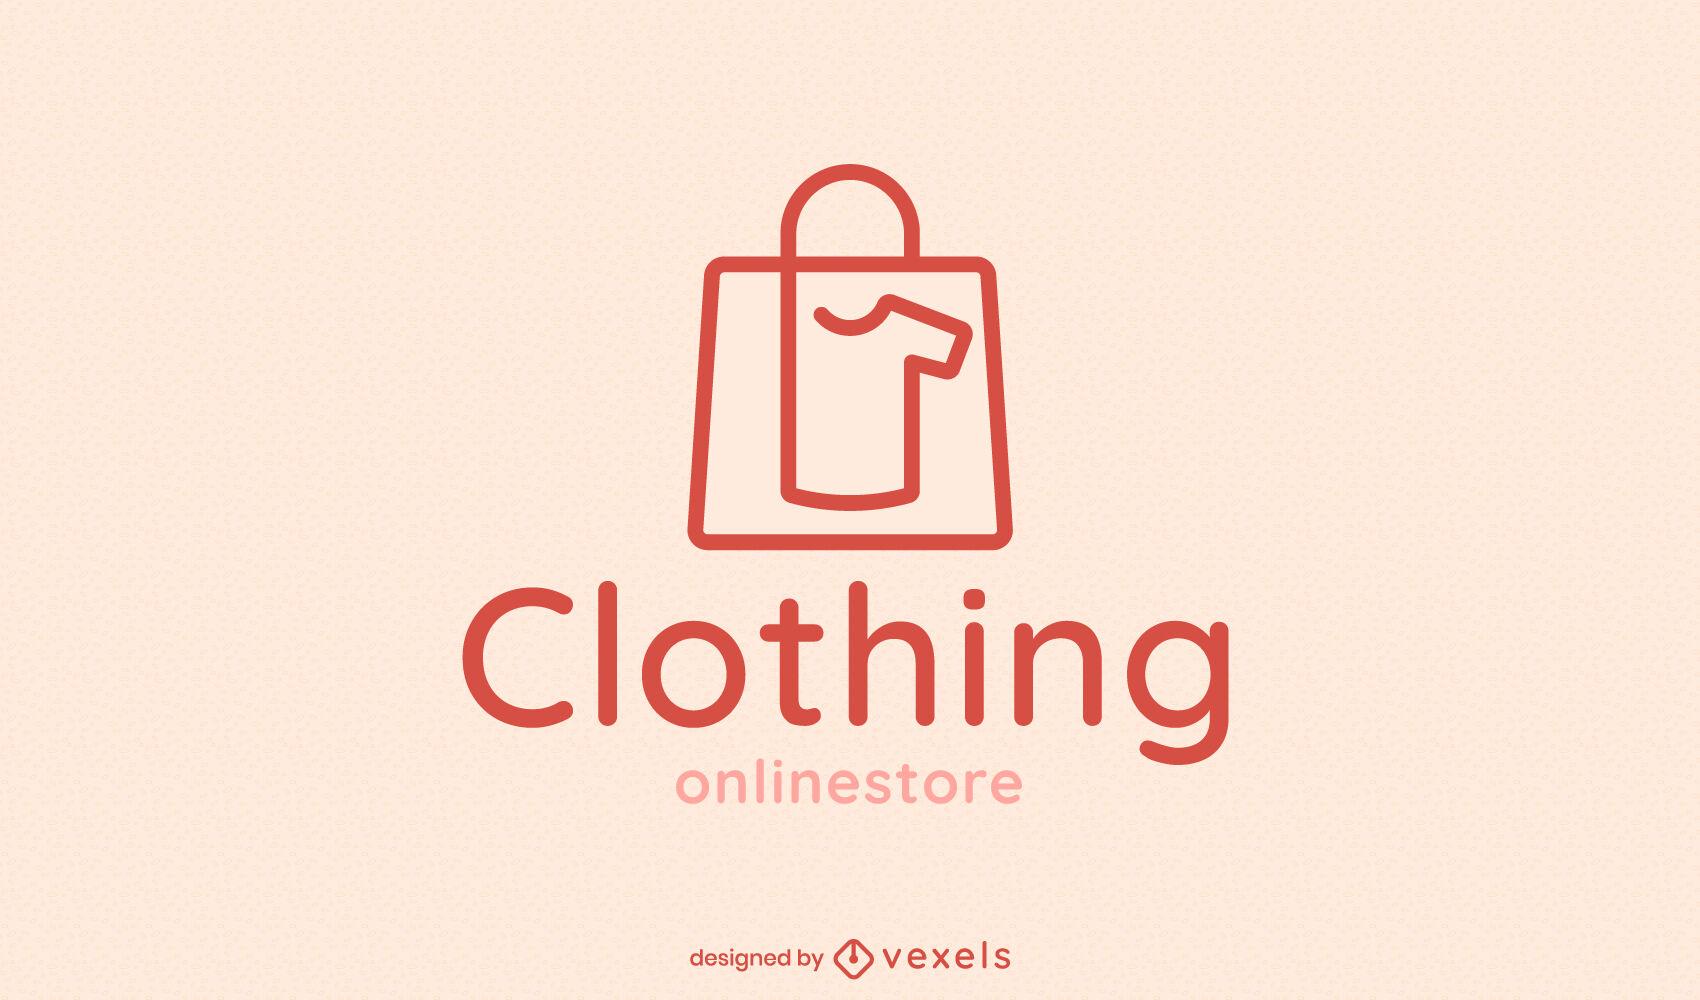 Clothing shopping bag logo